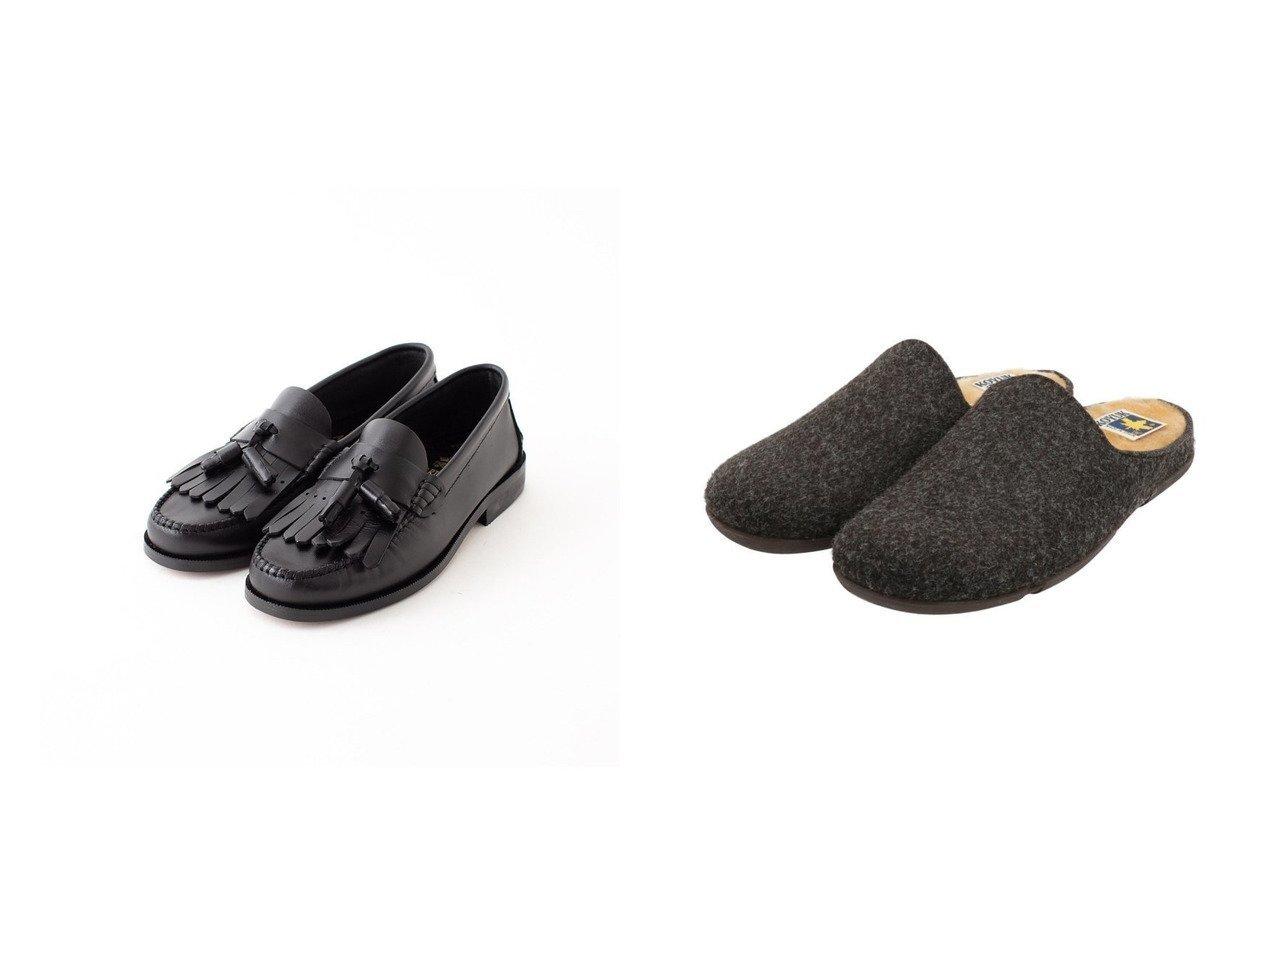 【KOYUK/コユック】のプレスフェルトサボ&【Rouge vif la cle/ルージュヴィフラクレ】の【ARTESANOS】フリンジローファー シューズ・靴のおすすめ!人気、トレンド・レディースファッションの通販  おすすめで人気の流行・トレンド、ファッションの通販商品 メンズファッション・キッズファッション・インテリア・家具・レディースファッション・服の通販 founy(ファニー) https://founy.com/ ファッション Fashion レディースファッション WOMEN シューズ マニッシュ スリッパ フェルト ライニング 人気 再入荷 Restock/Back in Stock/Re Arrival |ID:crp329100000019278